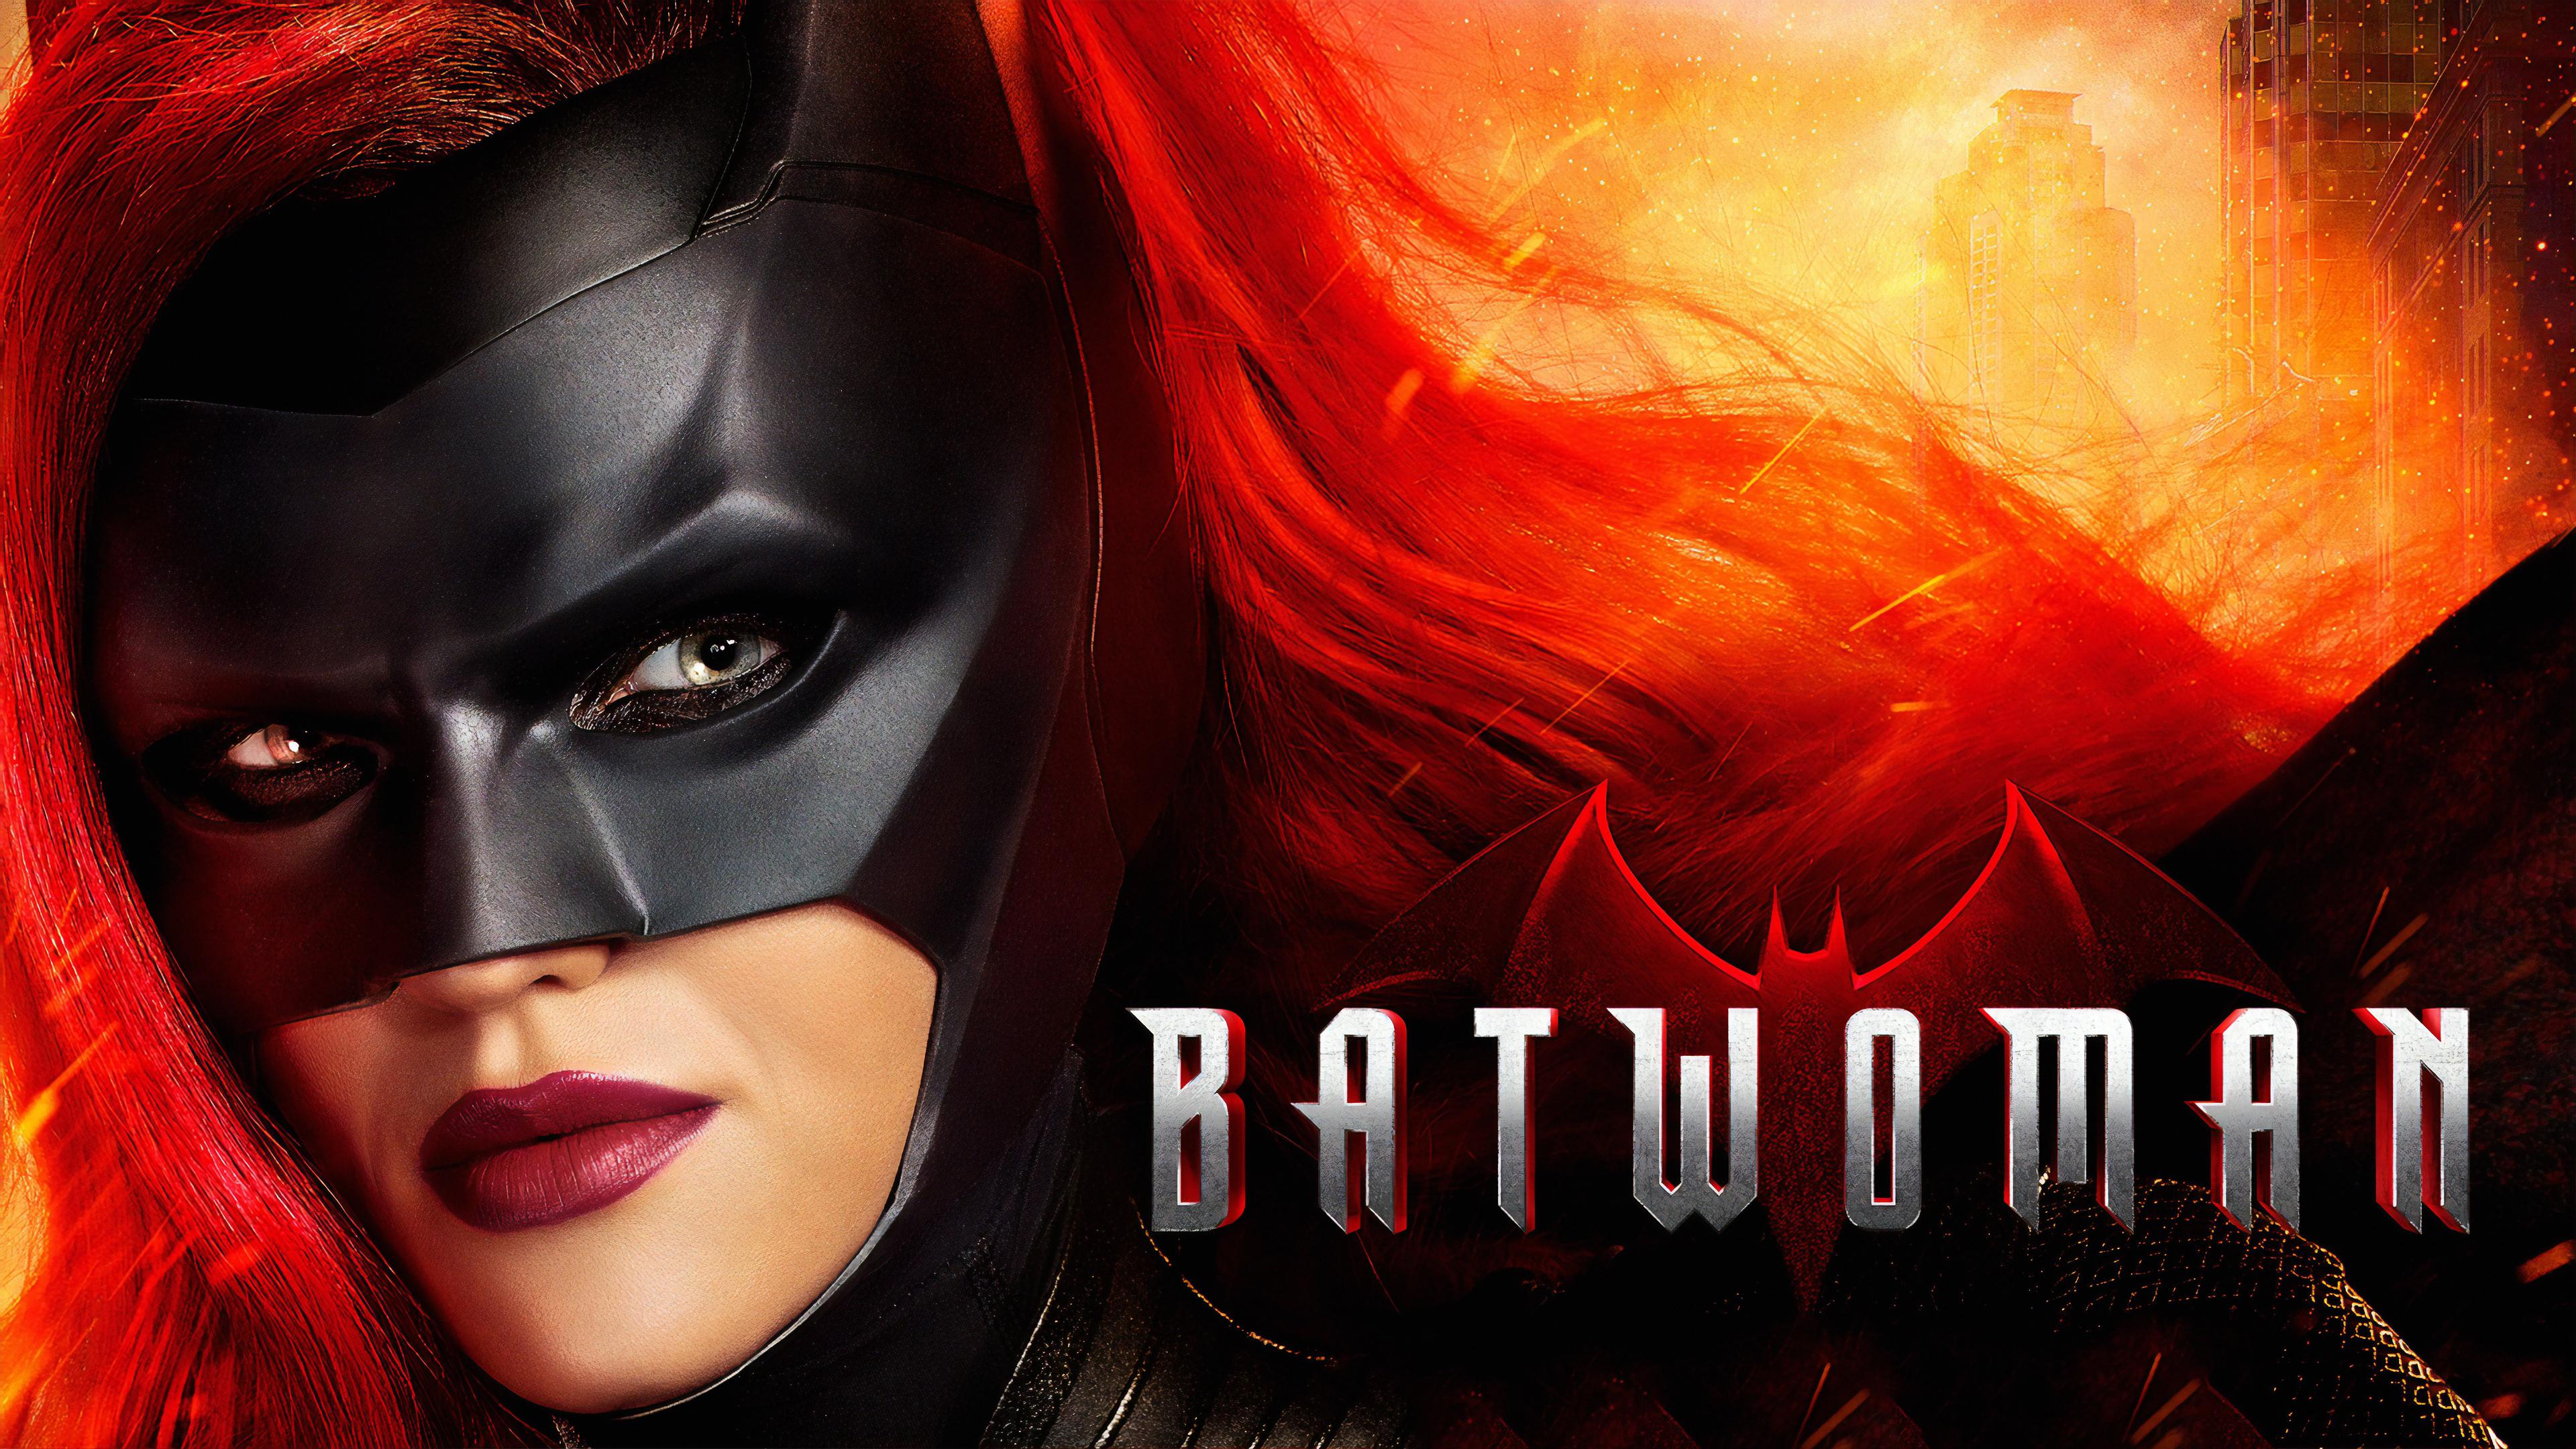 Batwoman 2019 Wallpaper, HD TV Series 4K Wallpapers